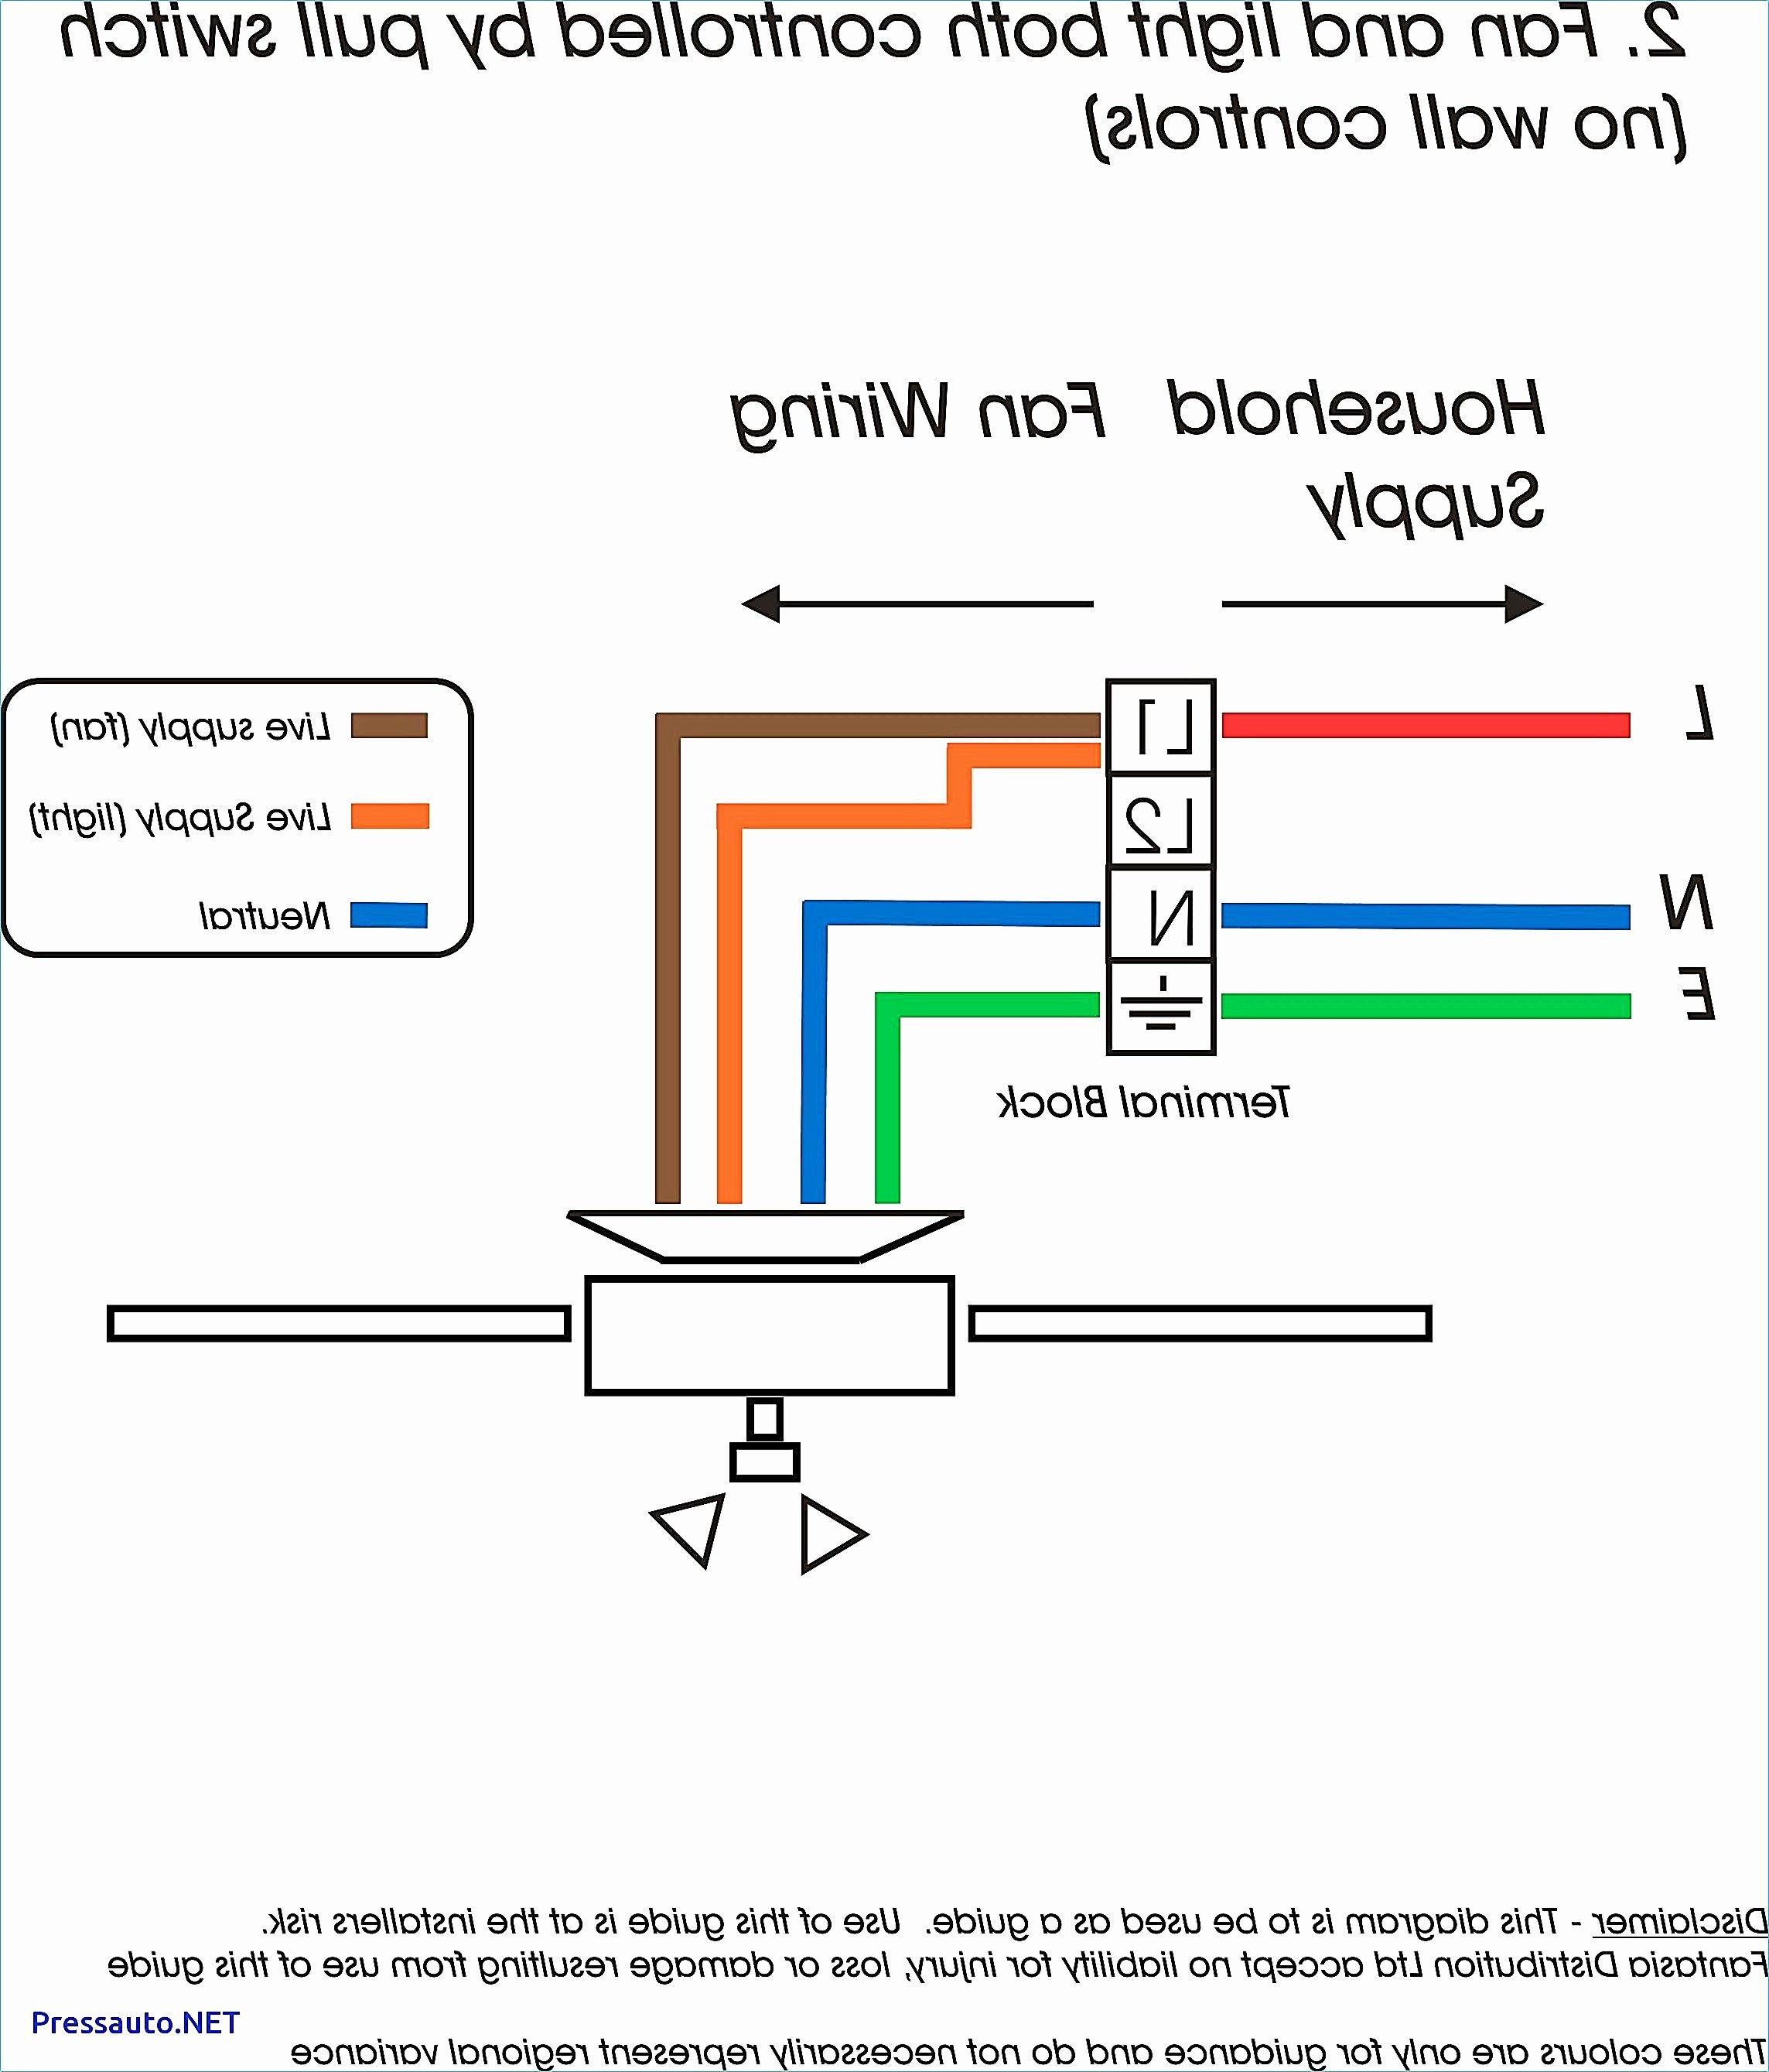 120V Transformer Wiring Diagram - All Wiring Diagram - 480V To 120V Transformer Wiring Diagram